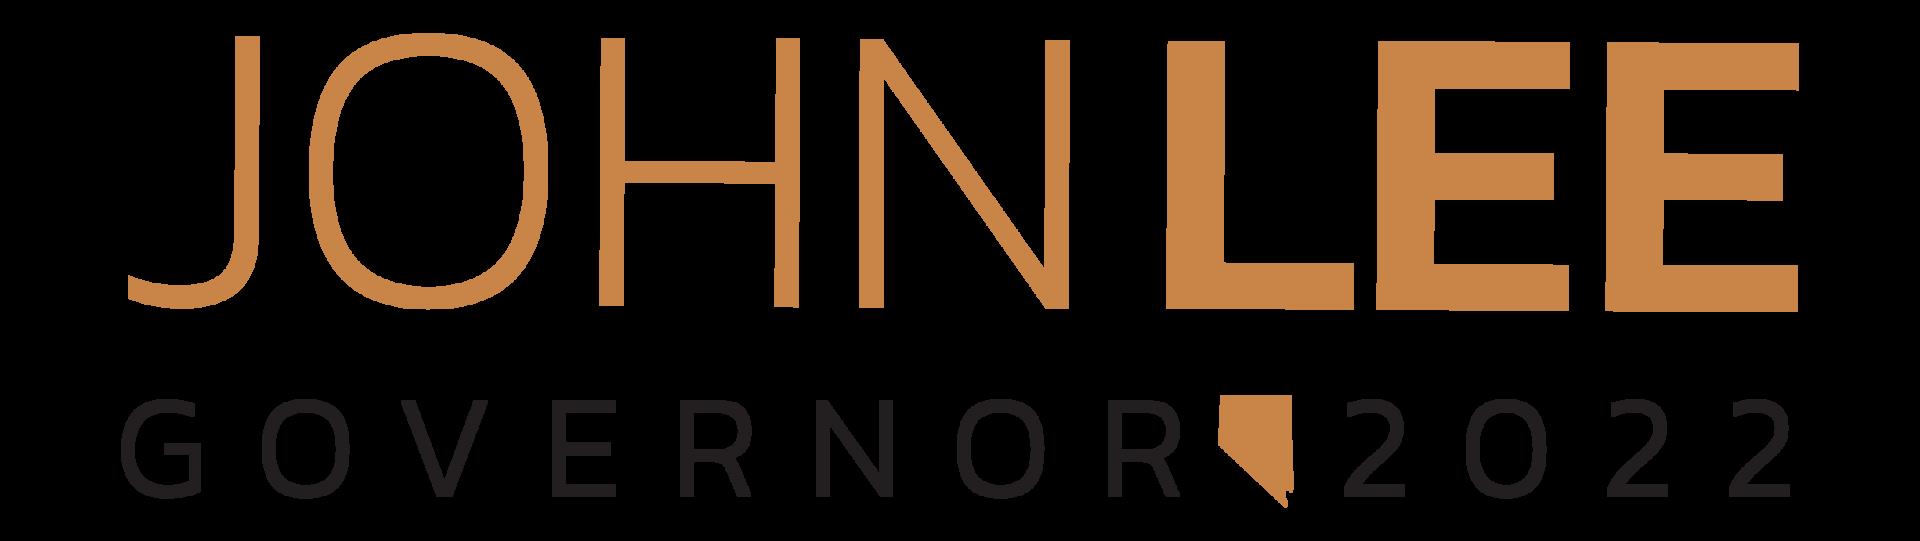 Lee john logo copy